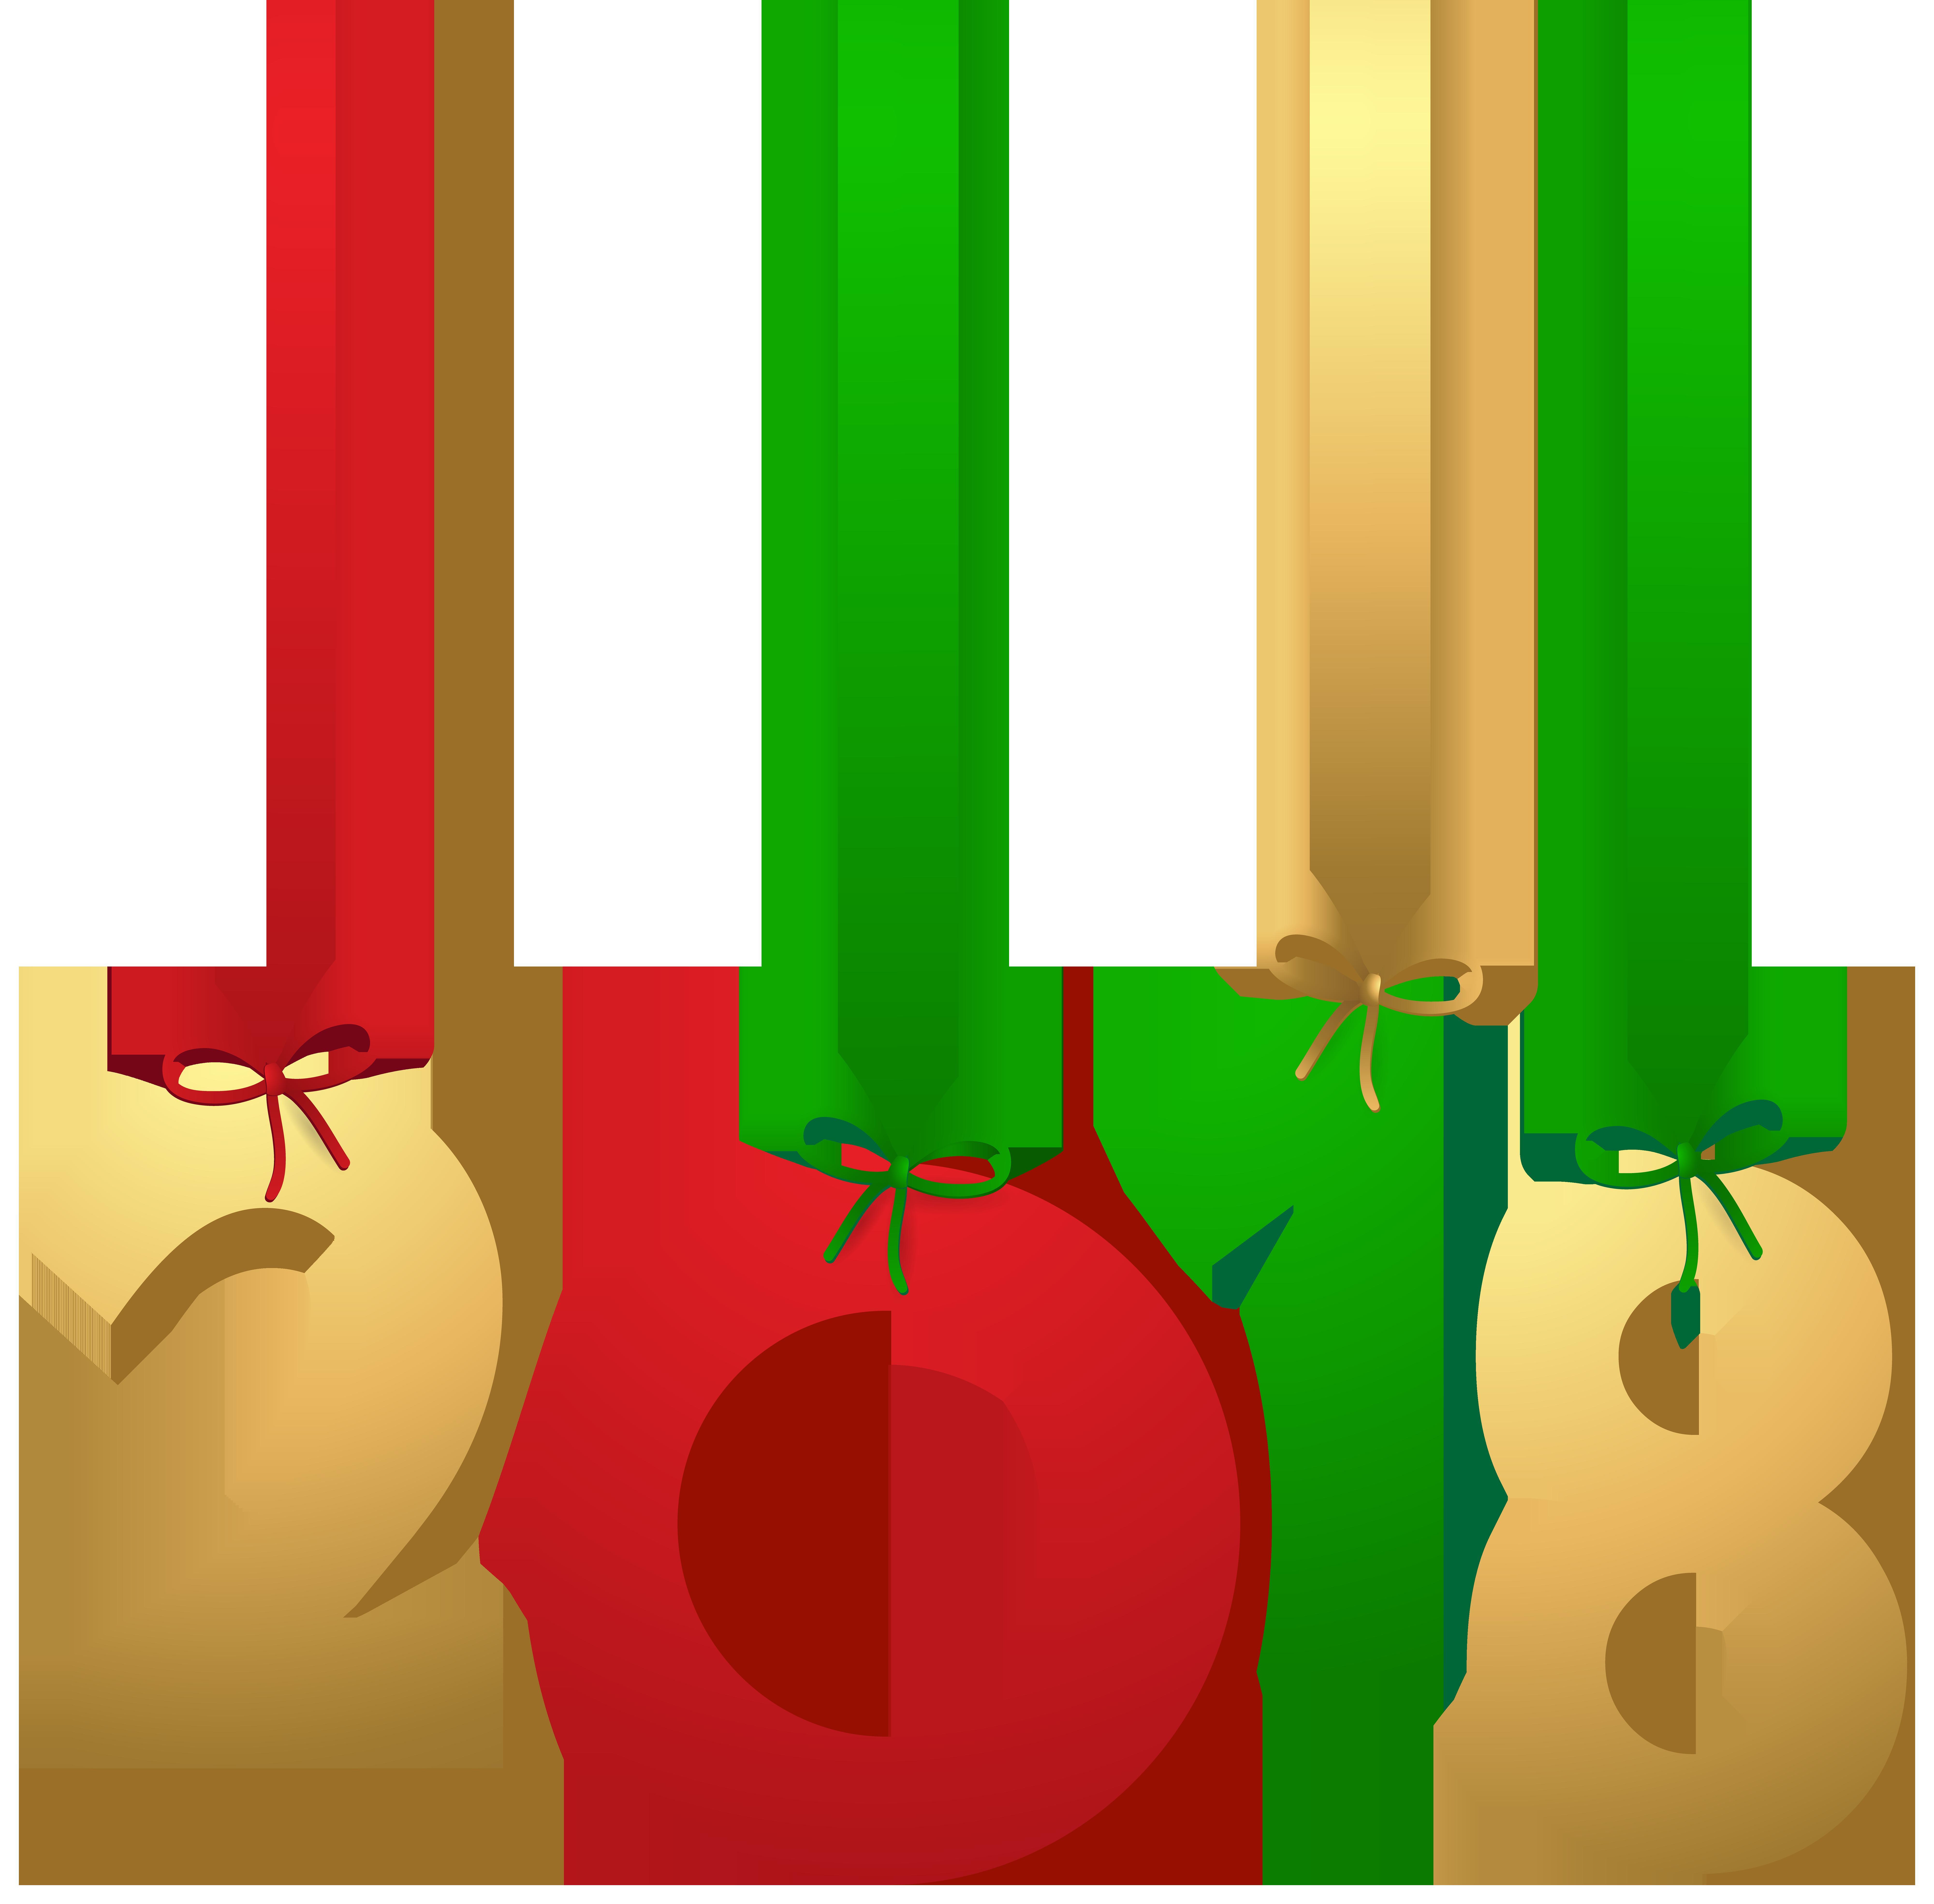 2018 Hanging Decoration PNG Clip Art Image.